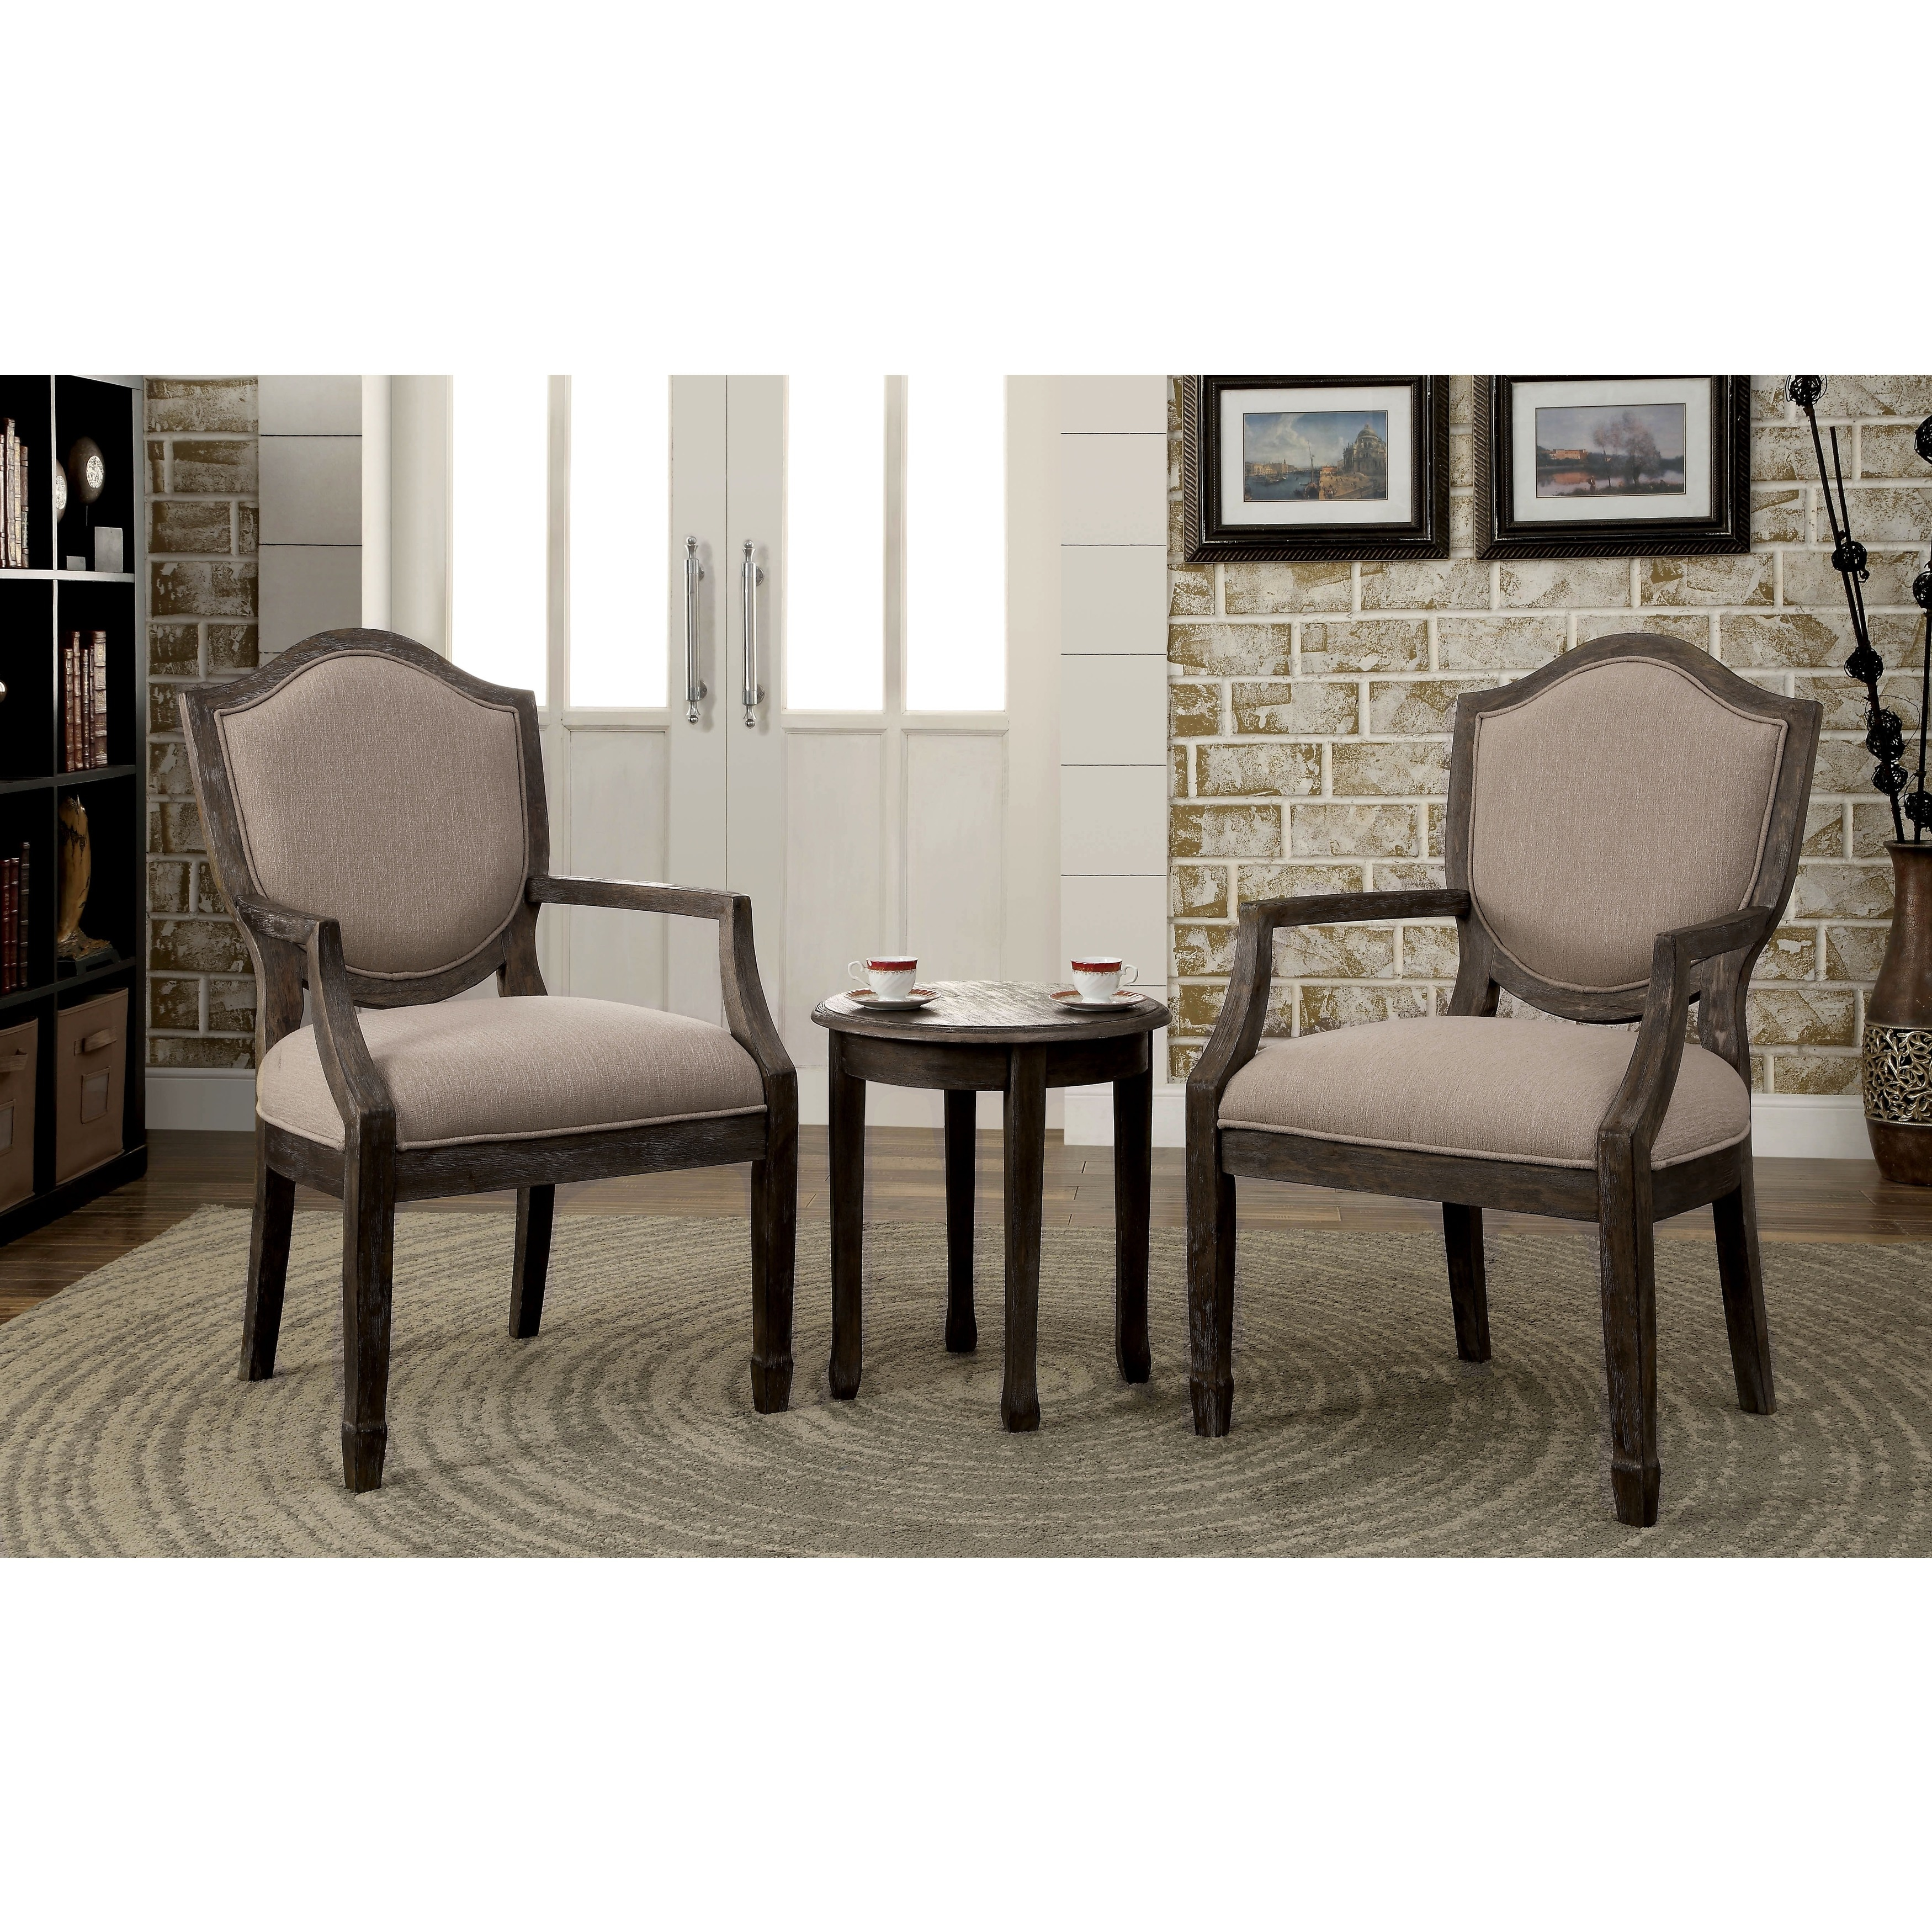 Living Room Furniture Deals: Furniture Of America Caroline 3-piece Living Room